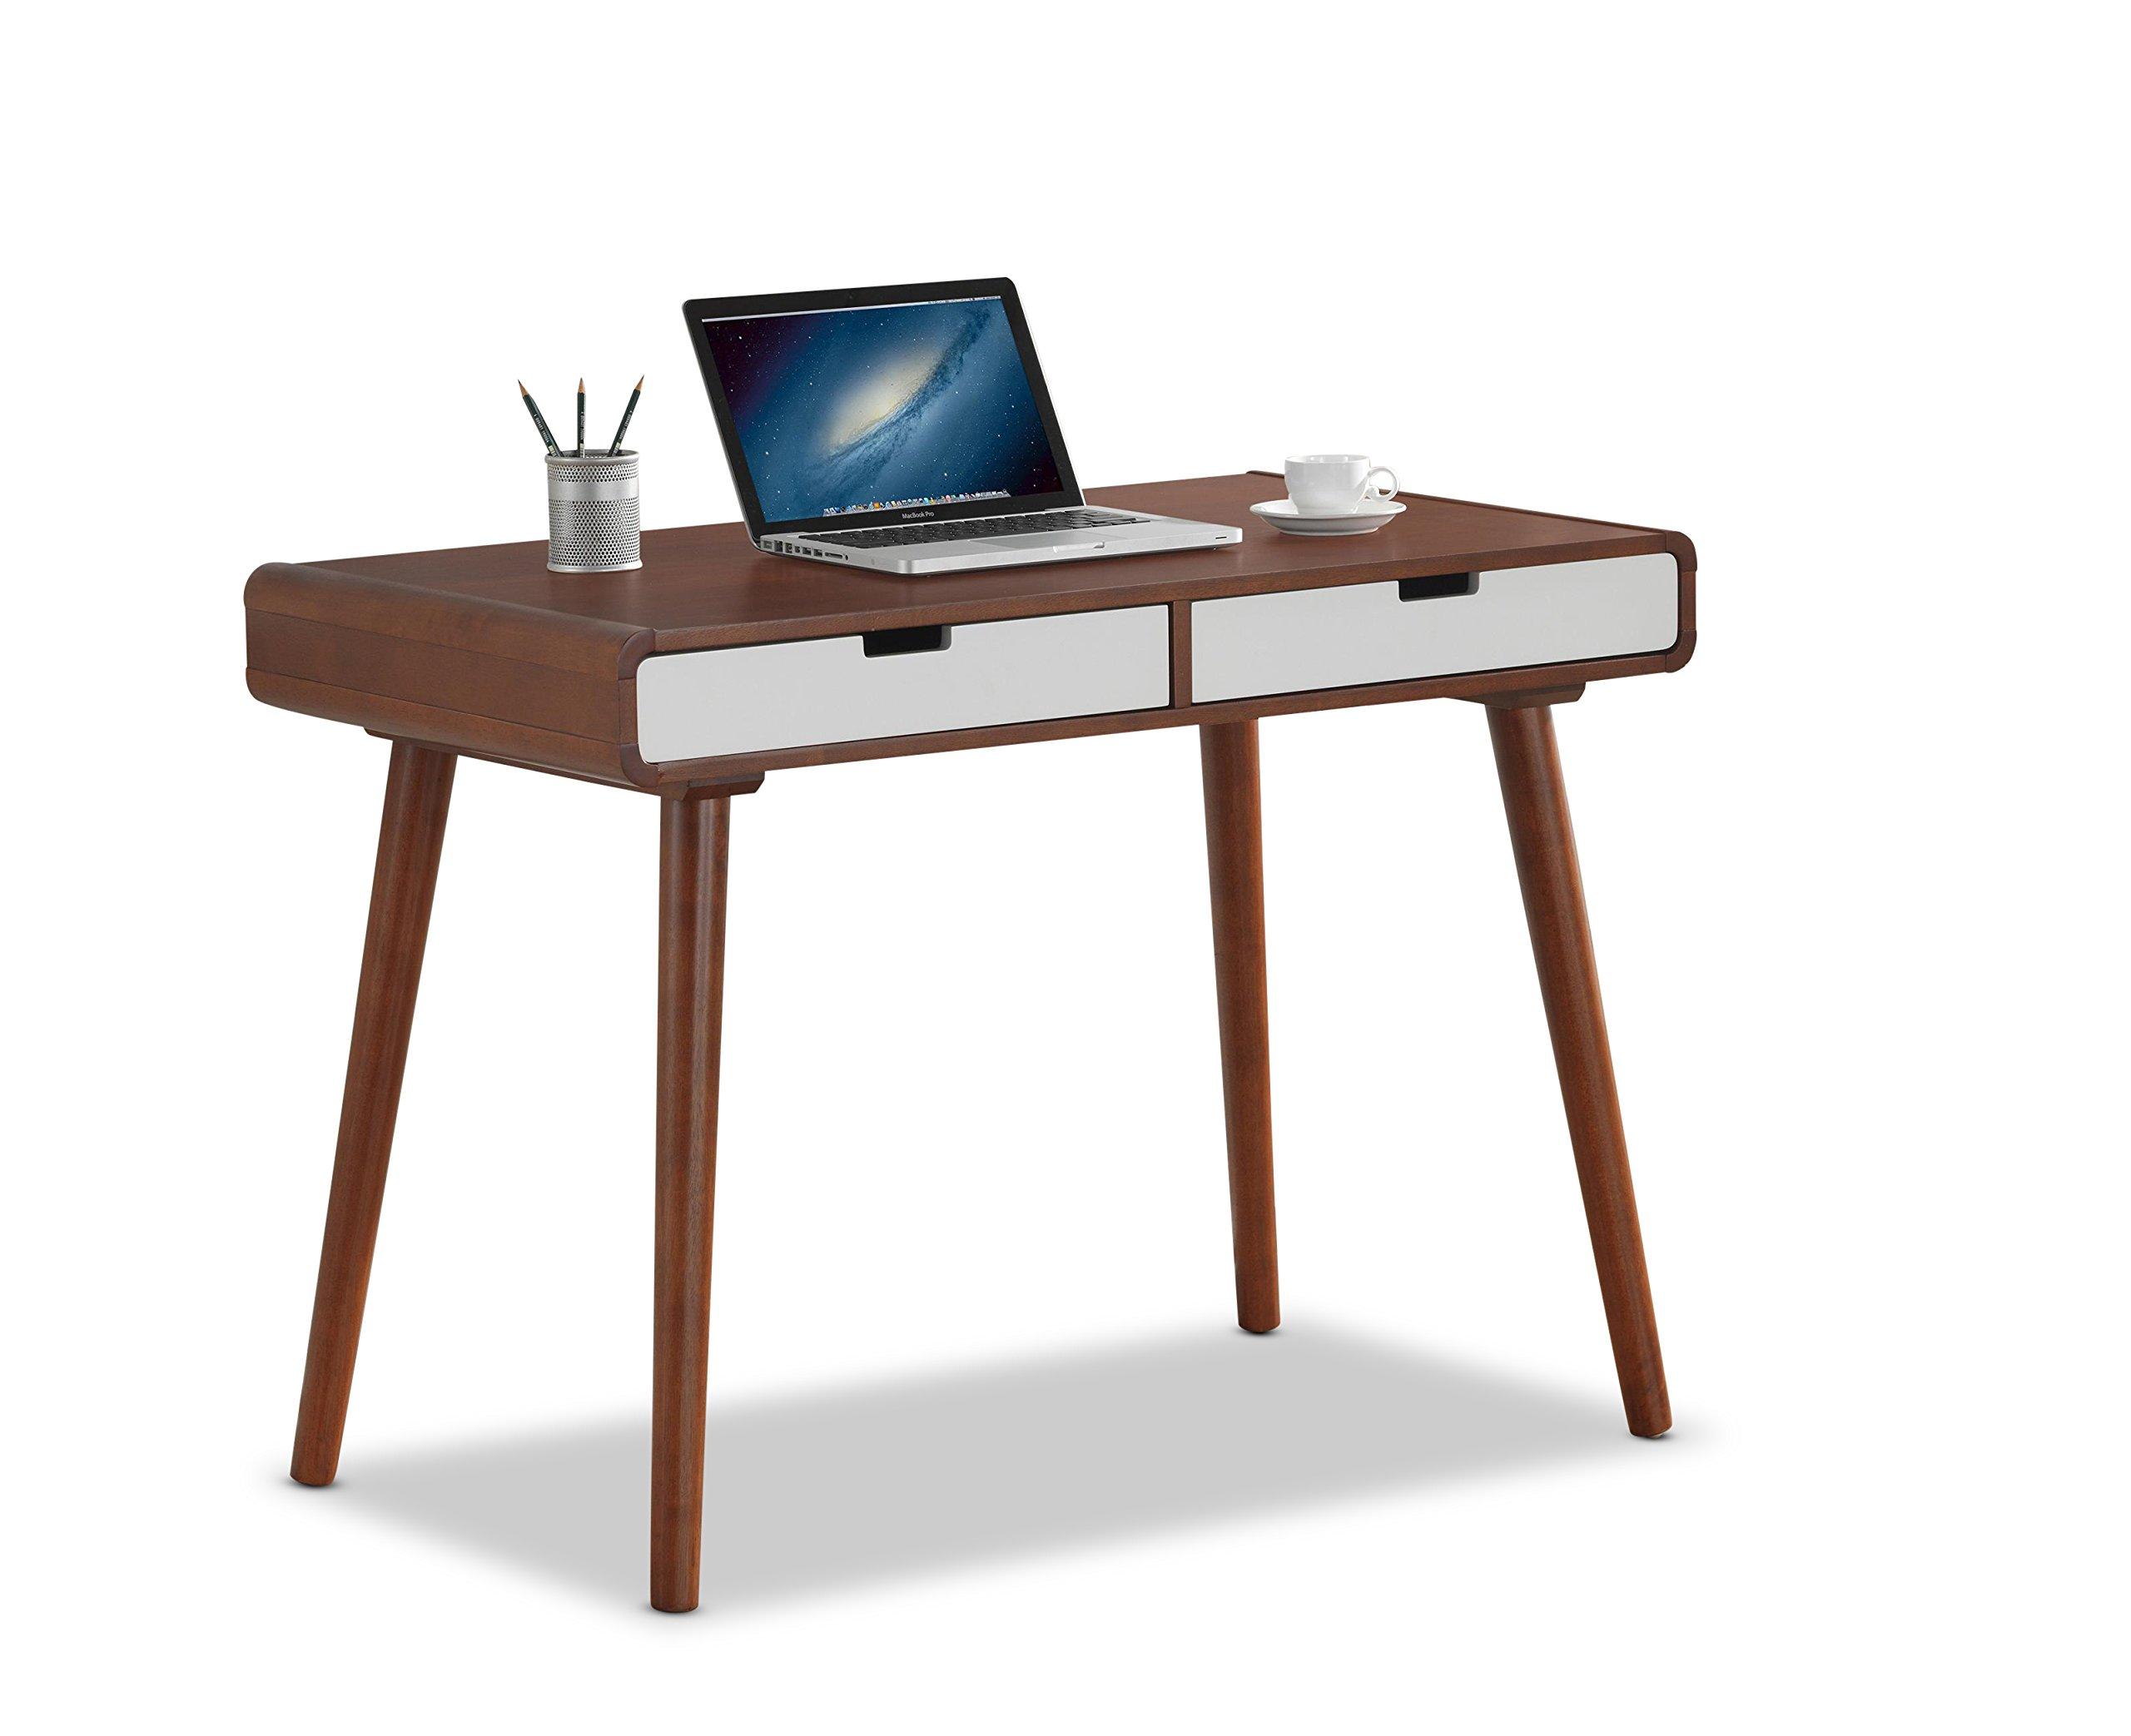 Baxton Furniture Studios Casarano Two-Tone Finish 2 Drawer Wood Home Office Writing Desk, Dark Walnut/White by Baxton Studio